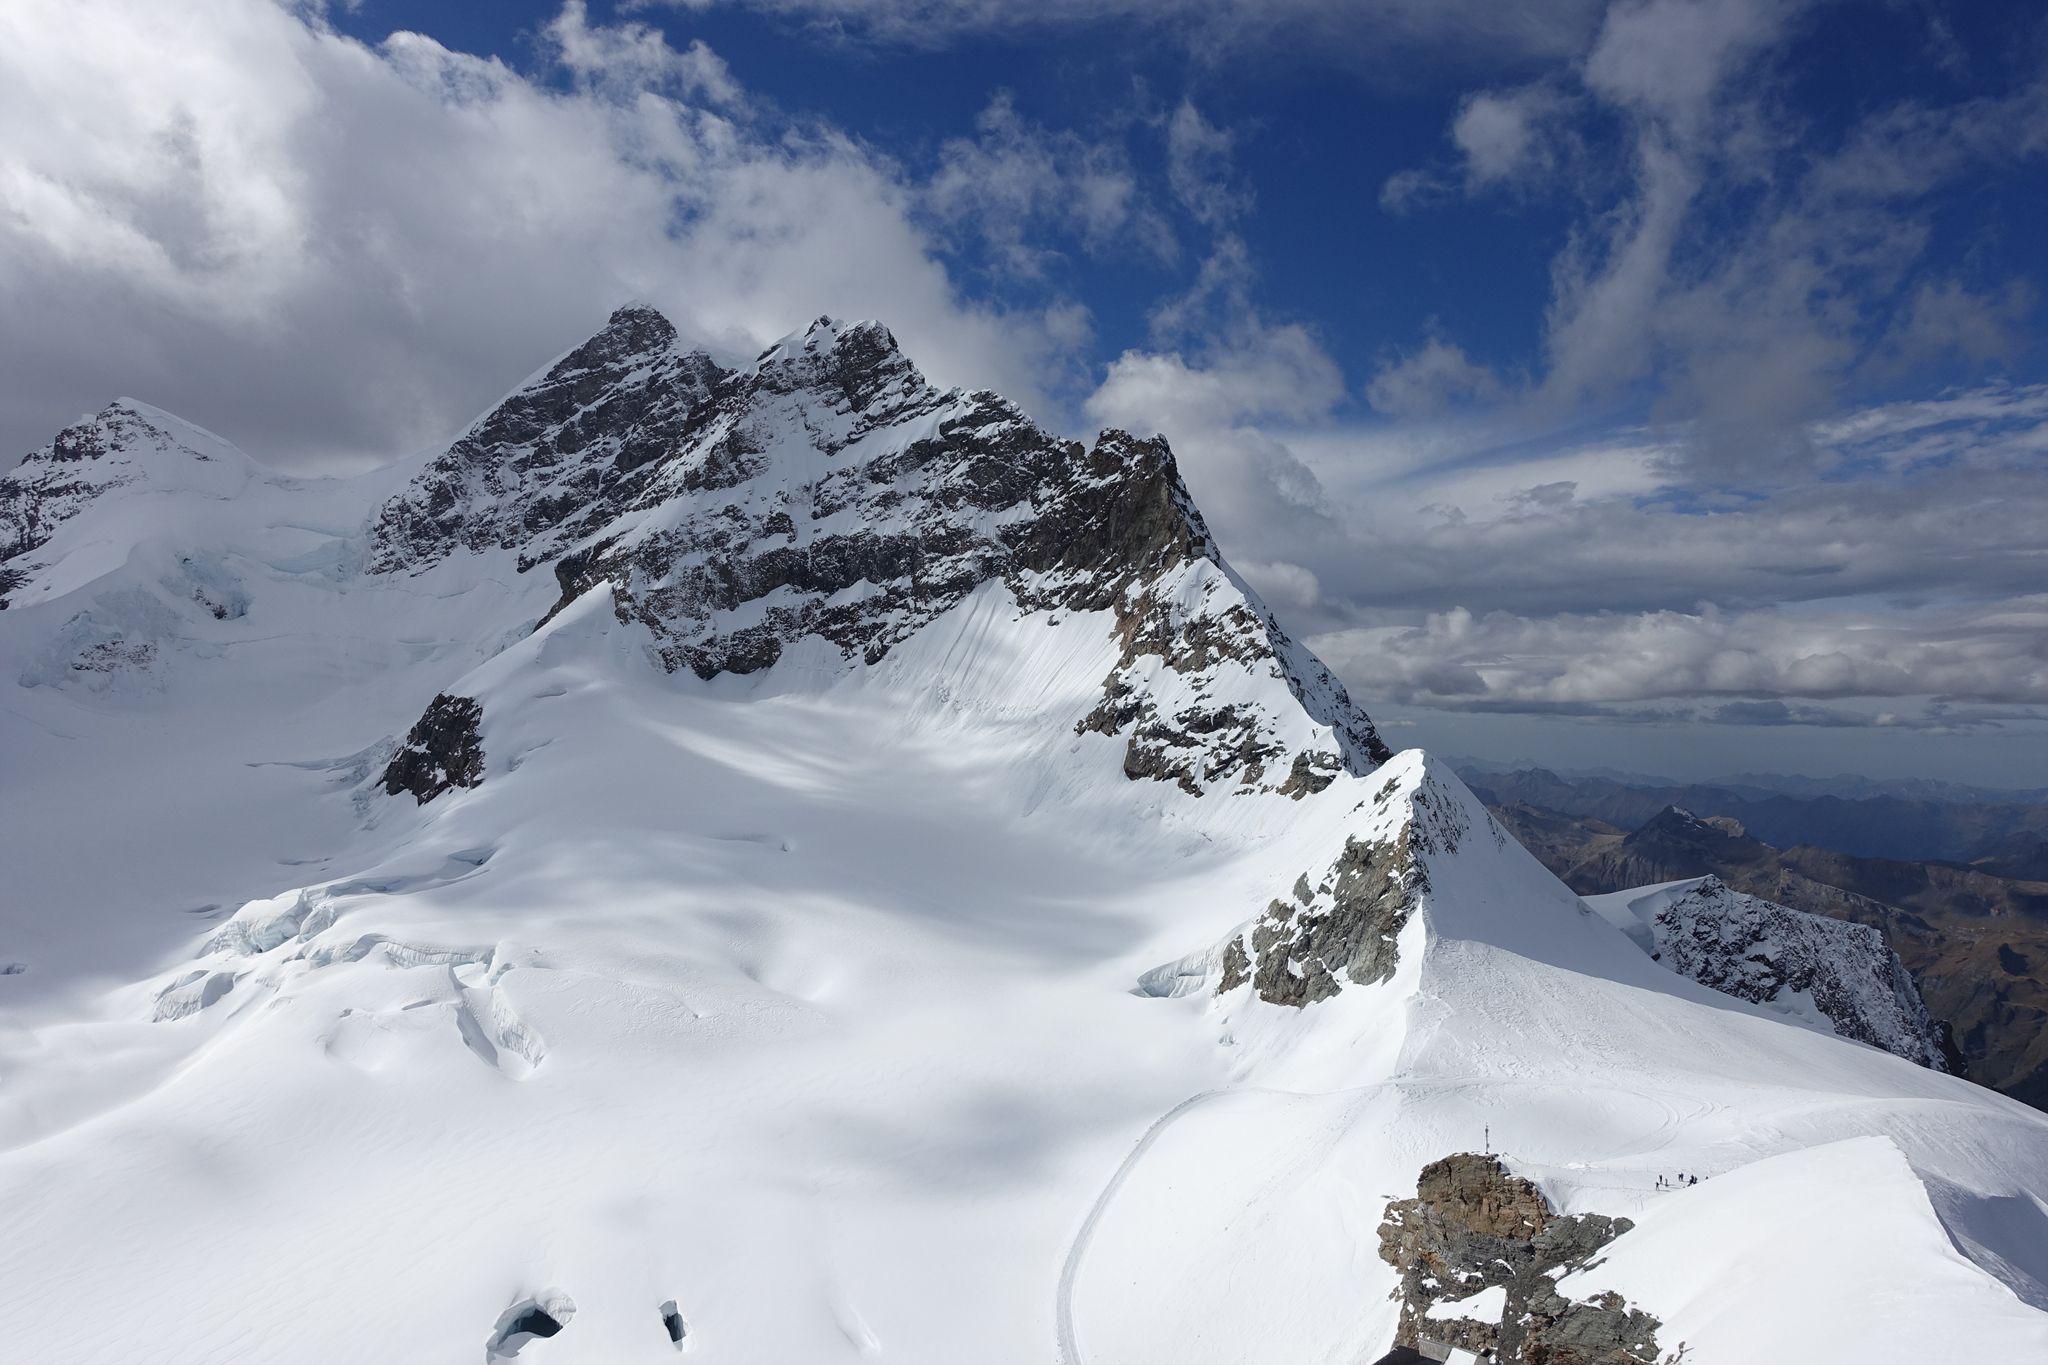 Landscape seen from the Jungfrau summit [OC] [2048 x 1365 2048x1365